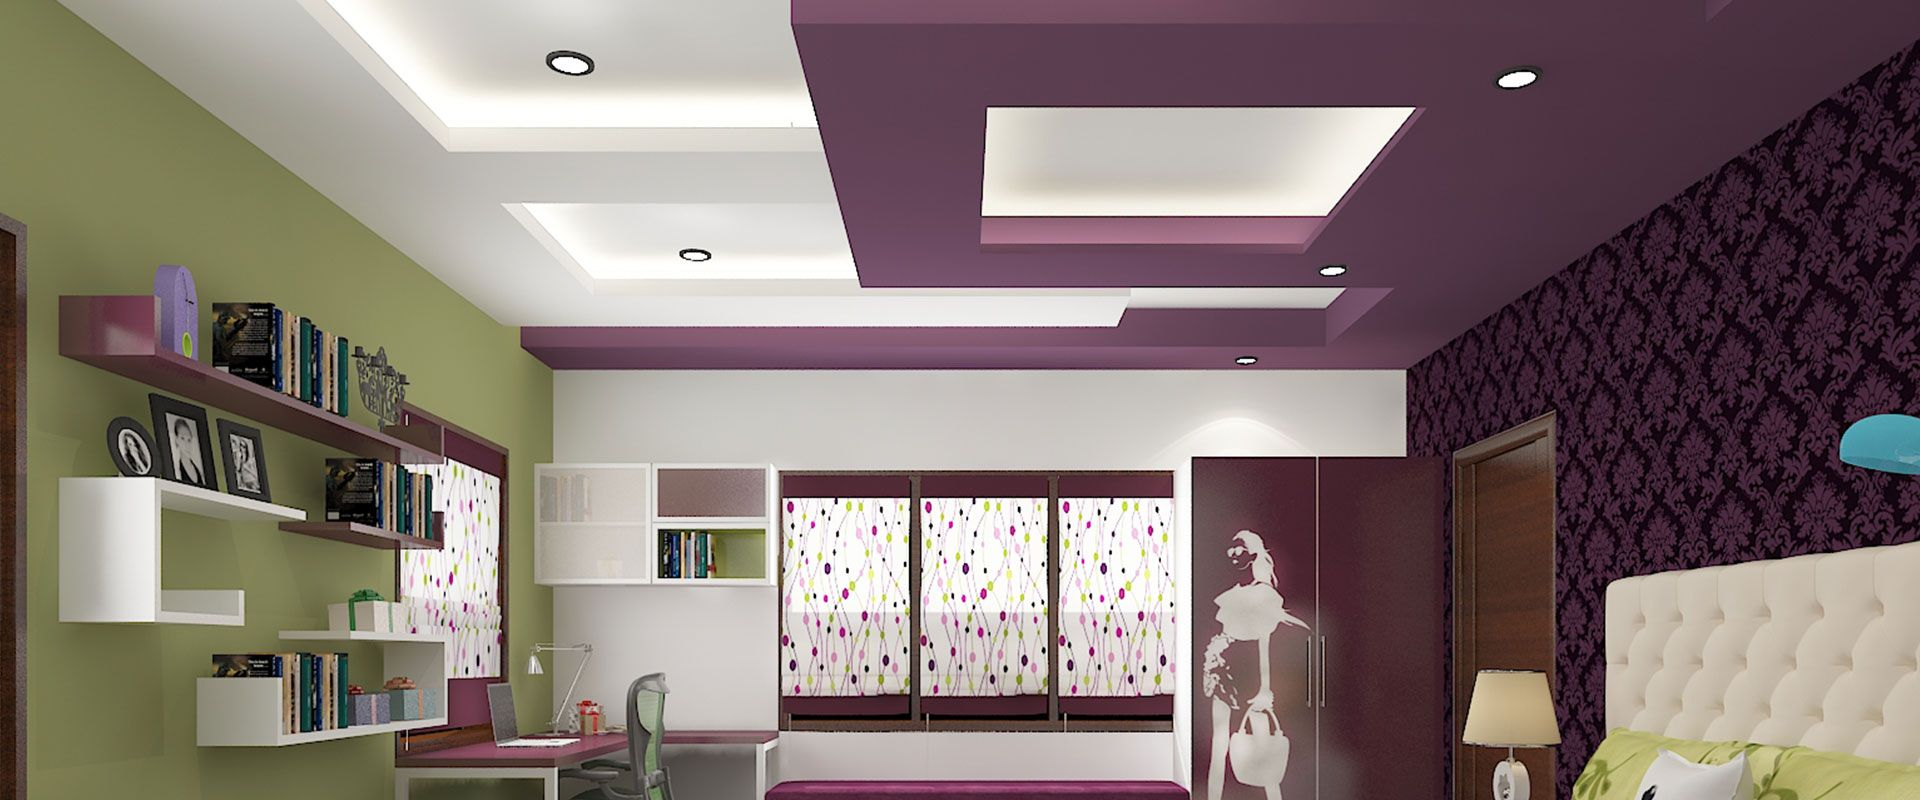 False Ceiling Gypsum Board Drywall Plaster Saint Gobain